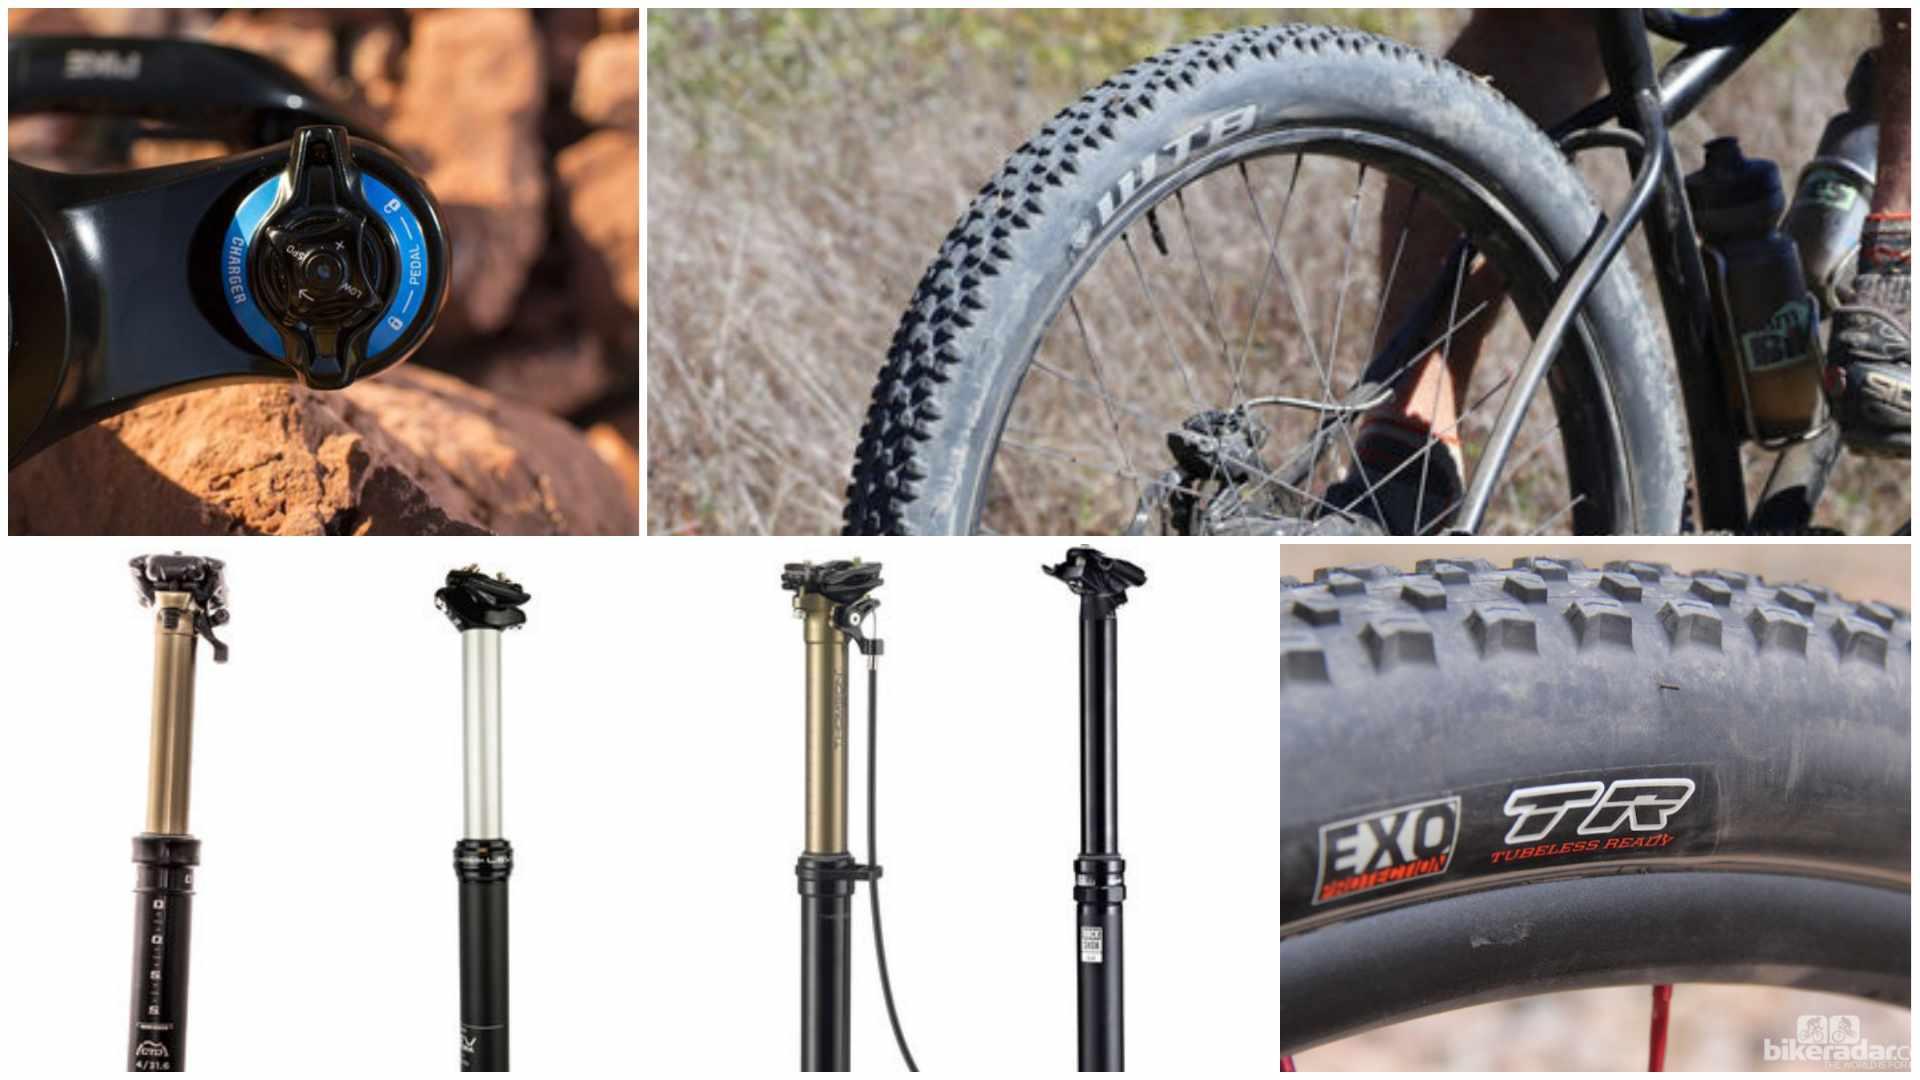 Josh Patterson's Trail Tech series is all about off-road bike tech